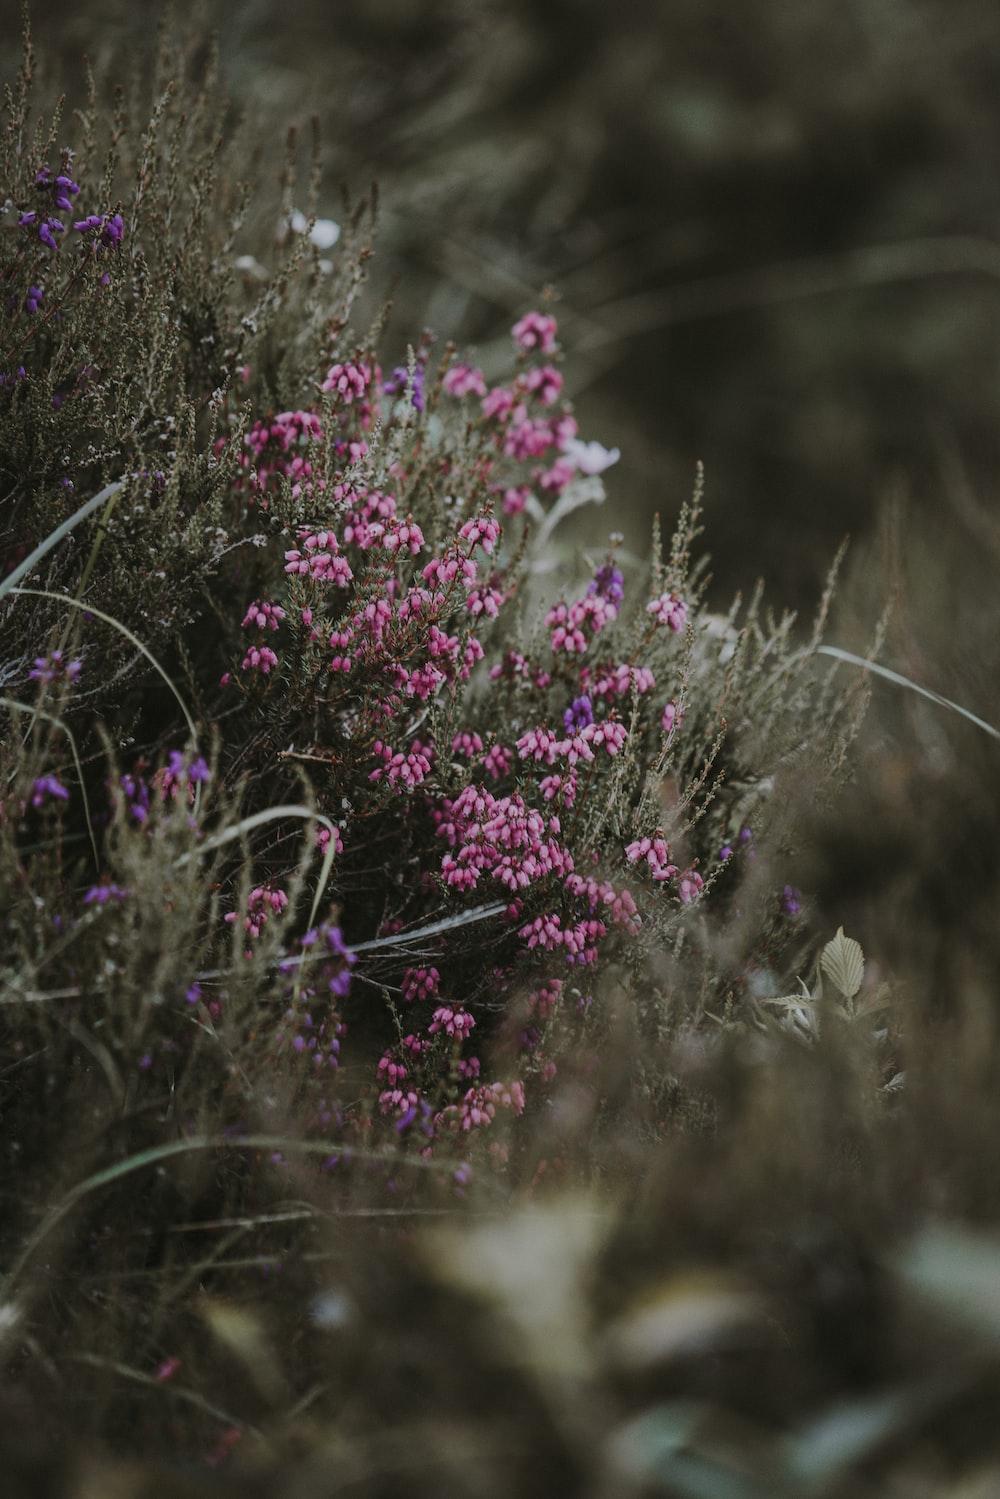 Pink Bush Pictures Download Free Images On Unsplash